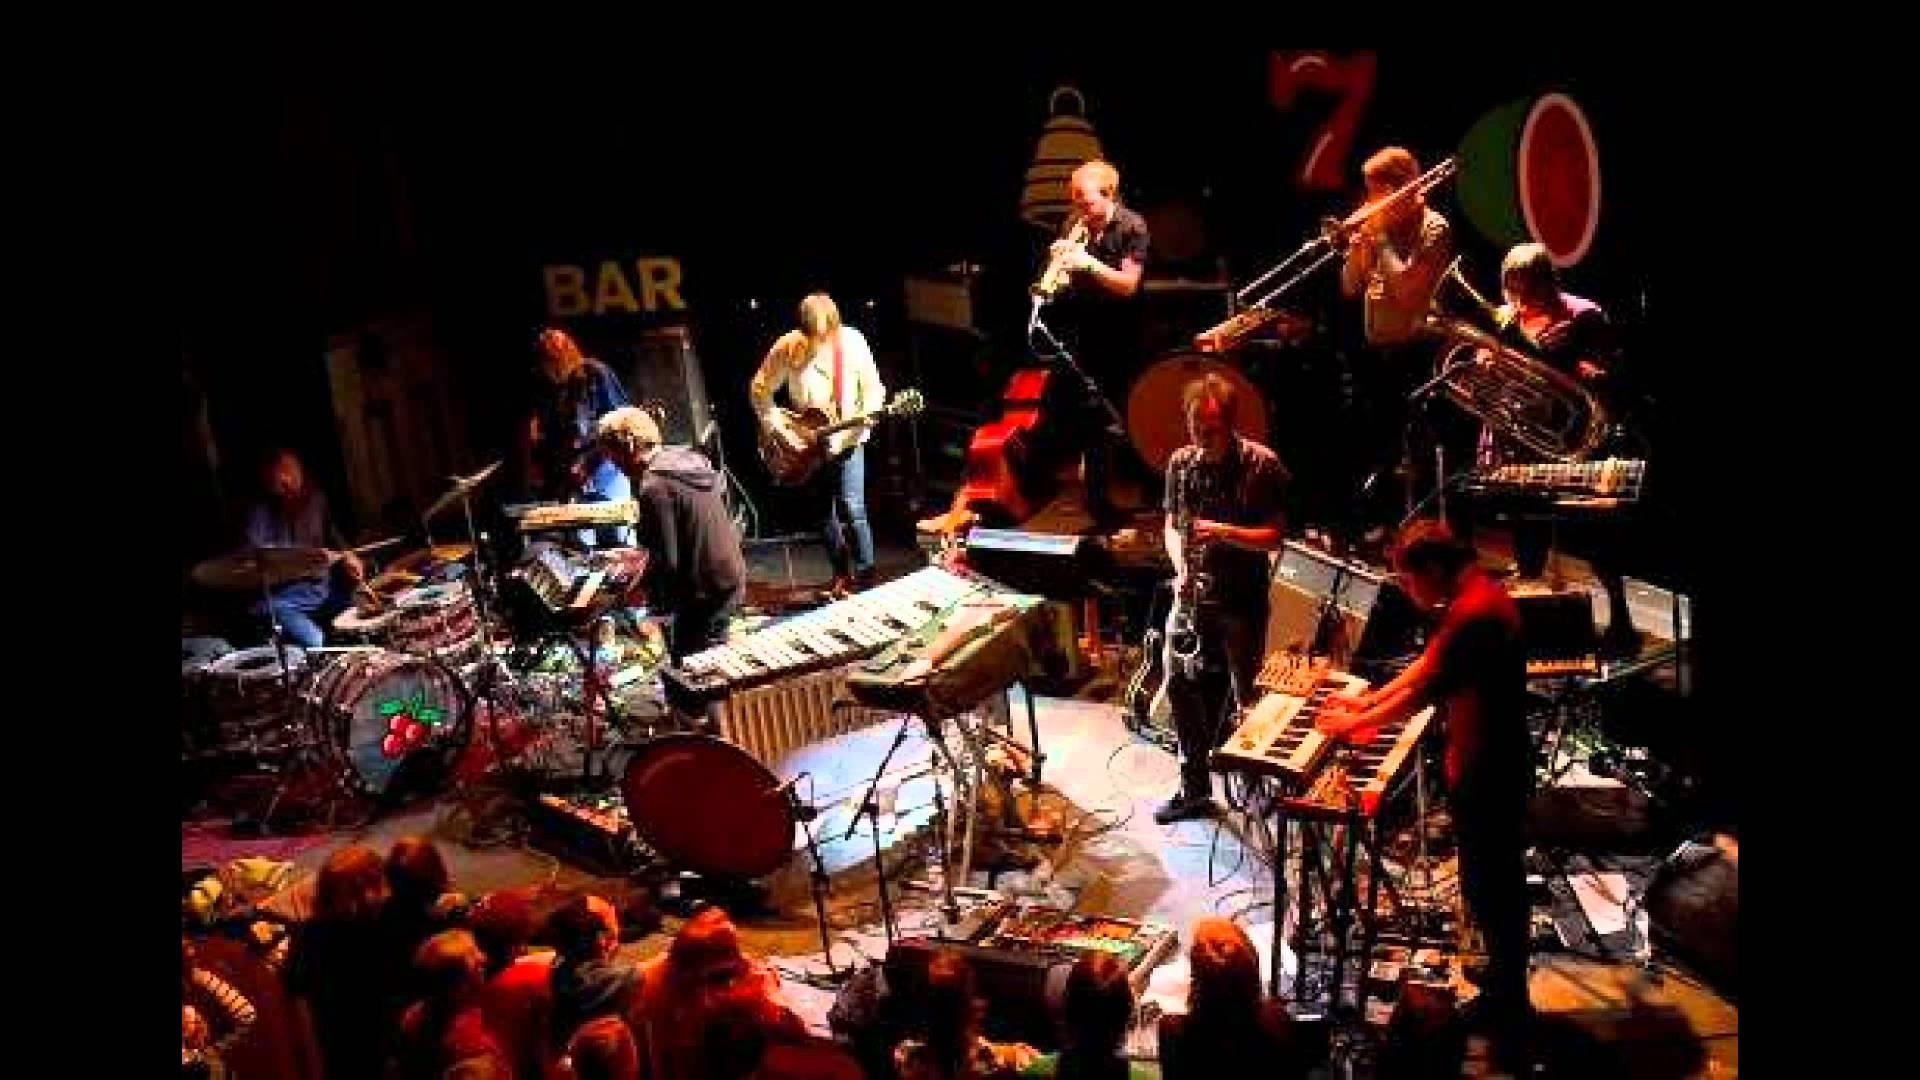 jaga jazzist culture whisper